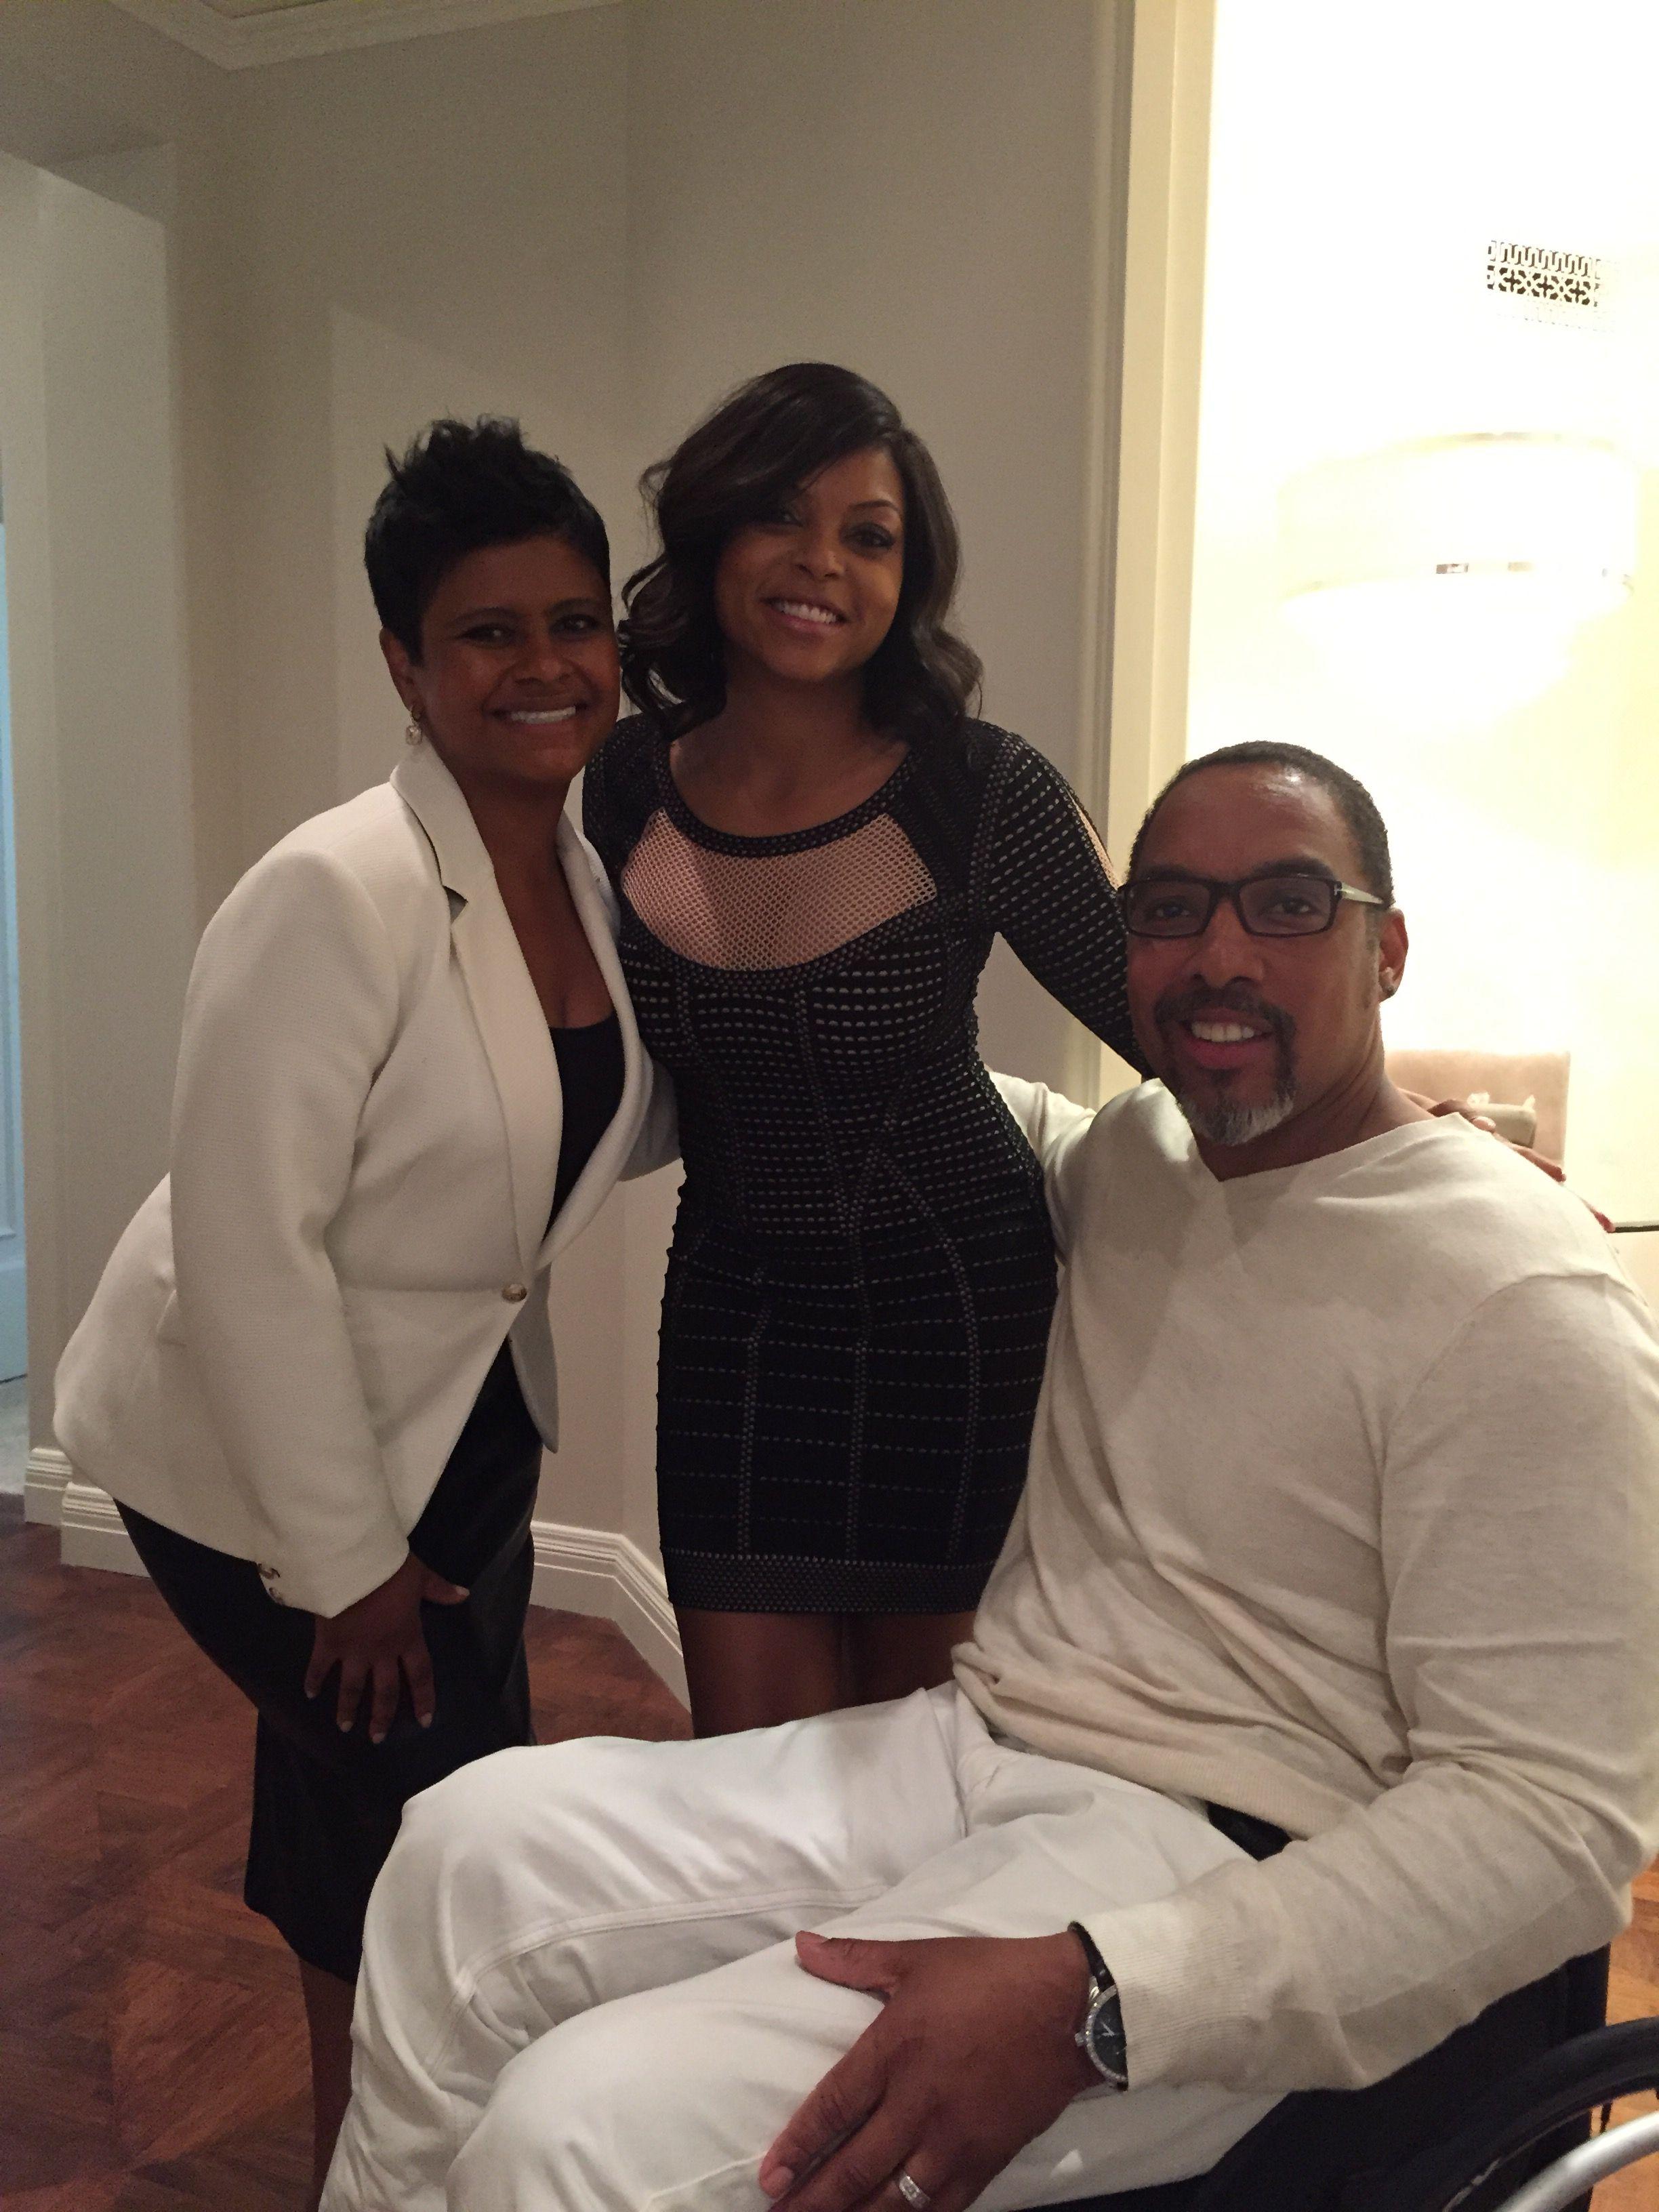 Alecia Johnson and husband Charles with Taraji Henson